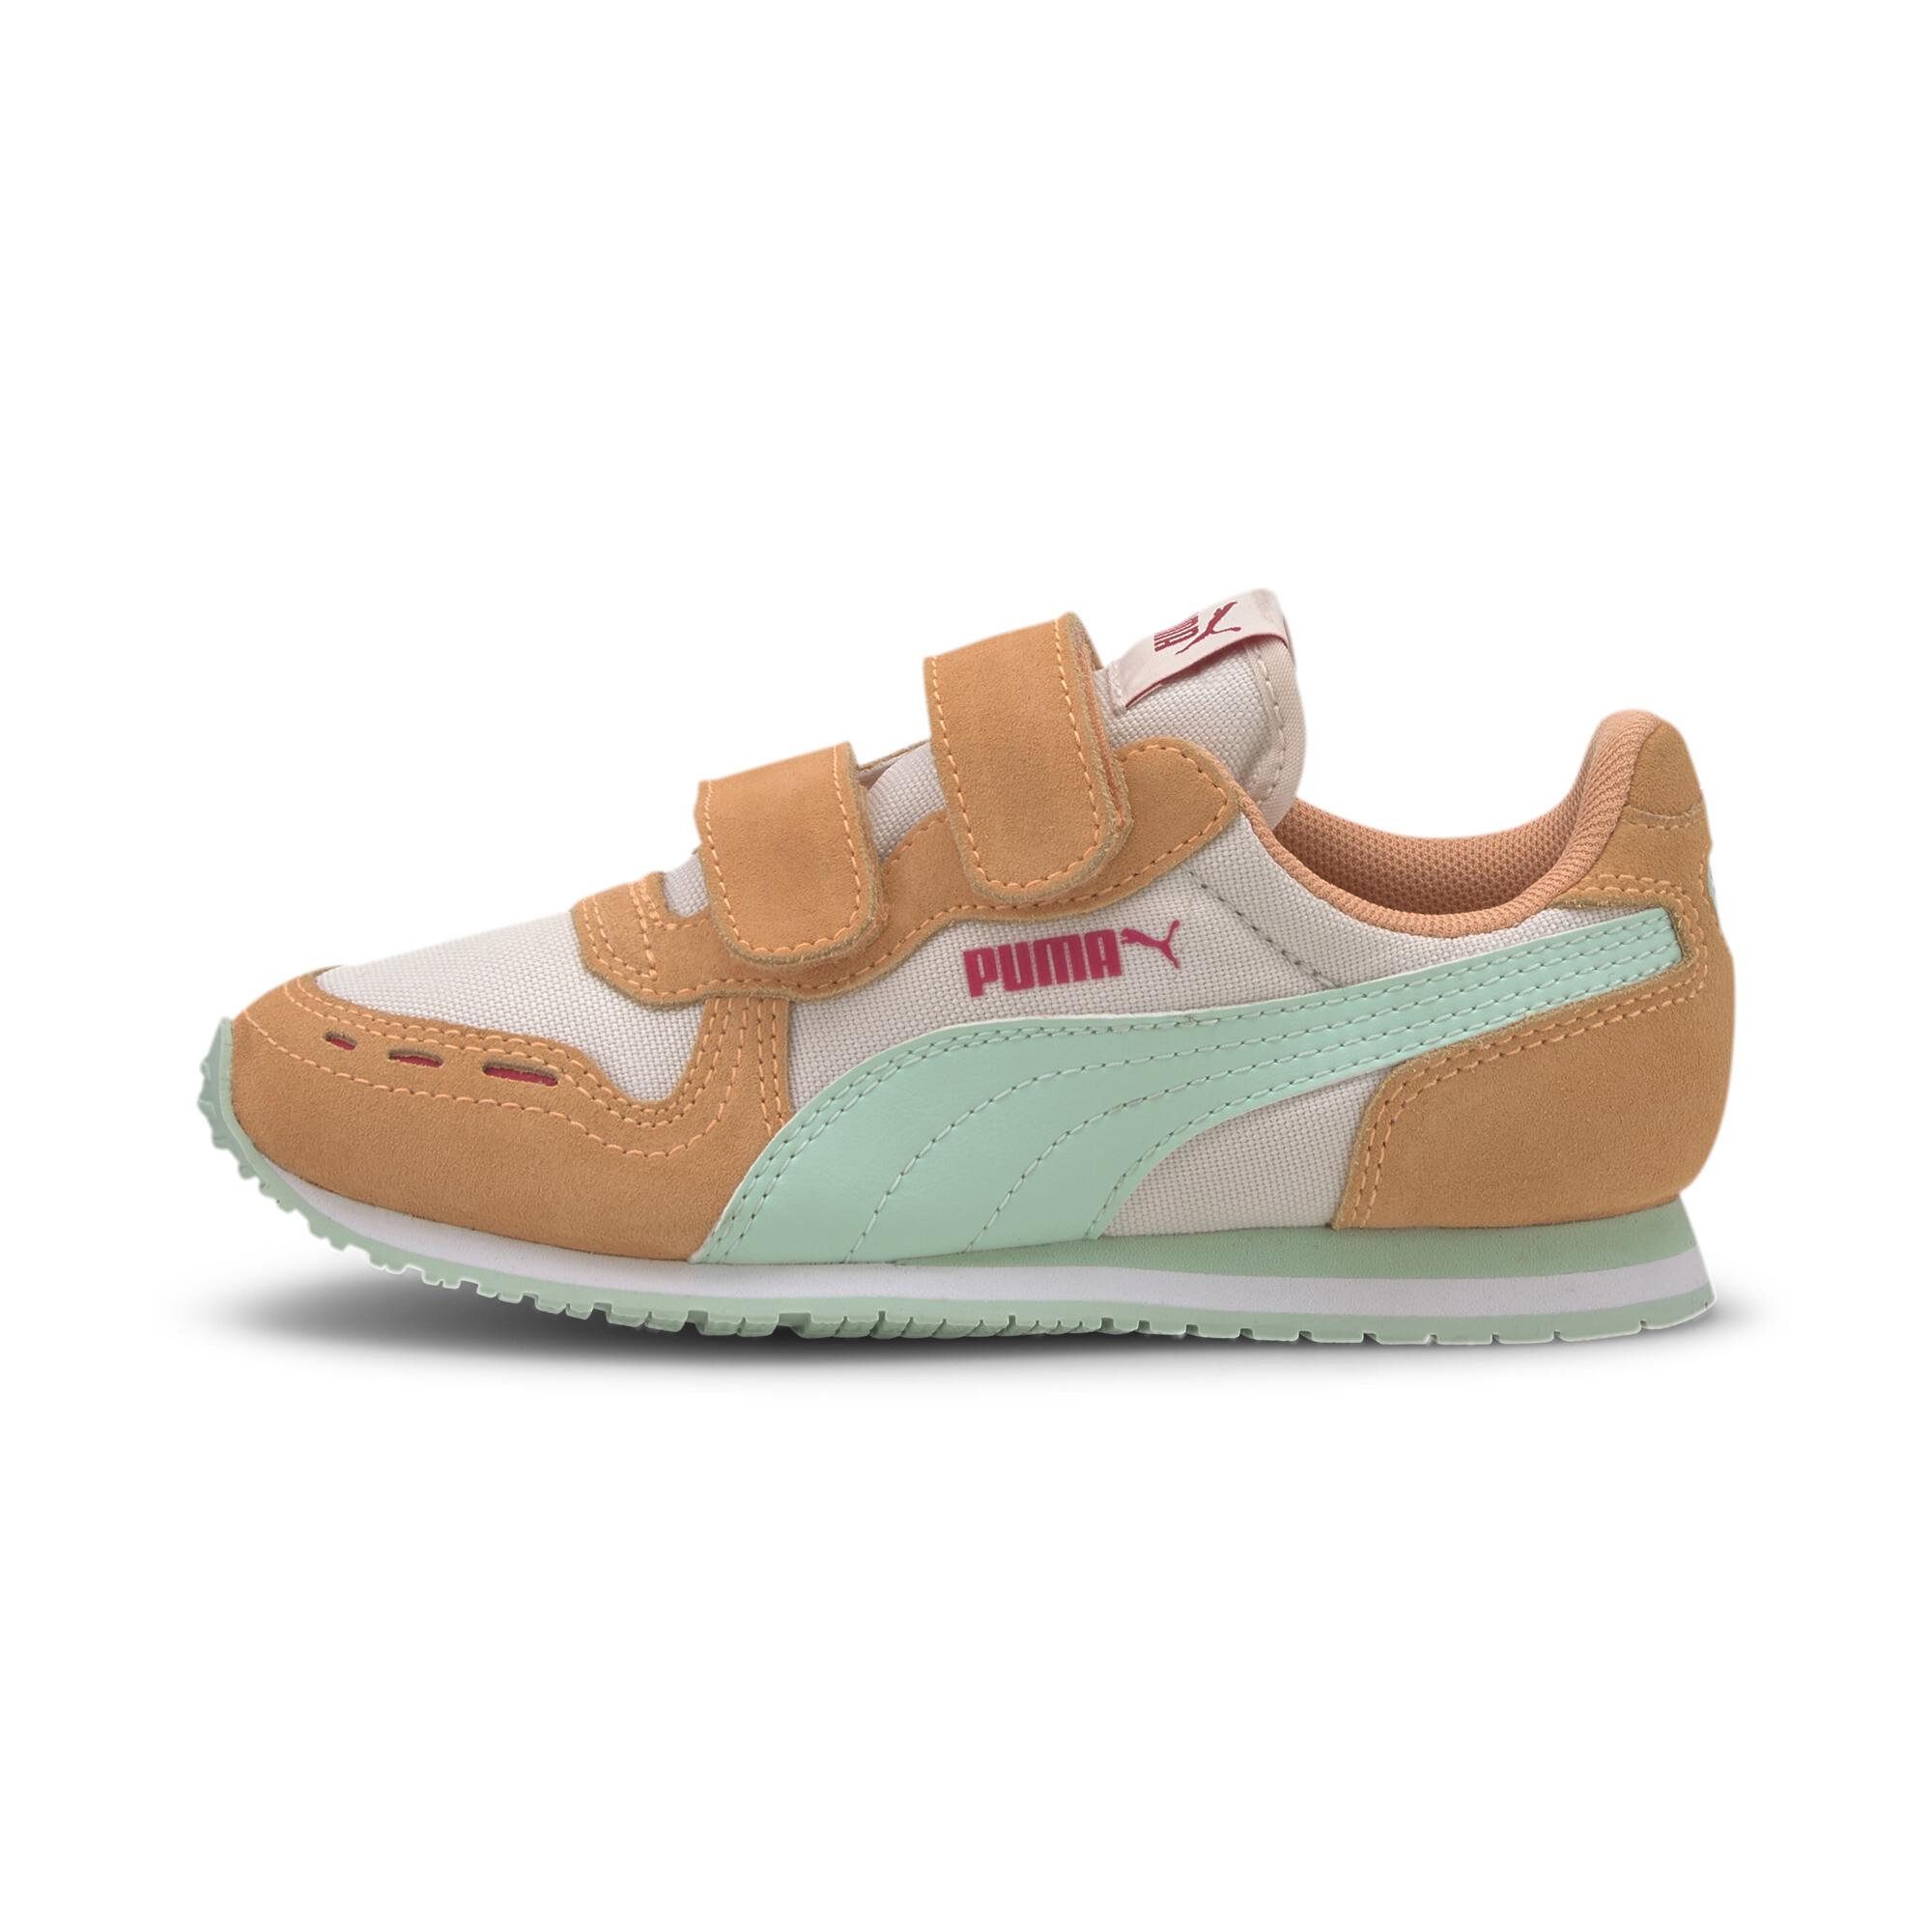 PUMA-Cabana-Racer-Little-Kids-039-Shoes-Kids-Shoe-Kids thumbnail 21